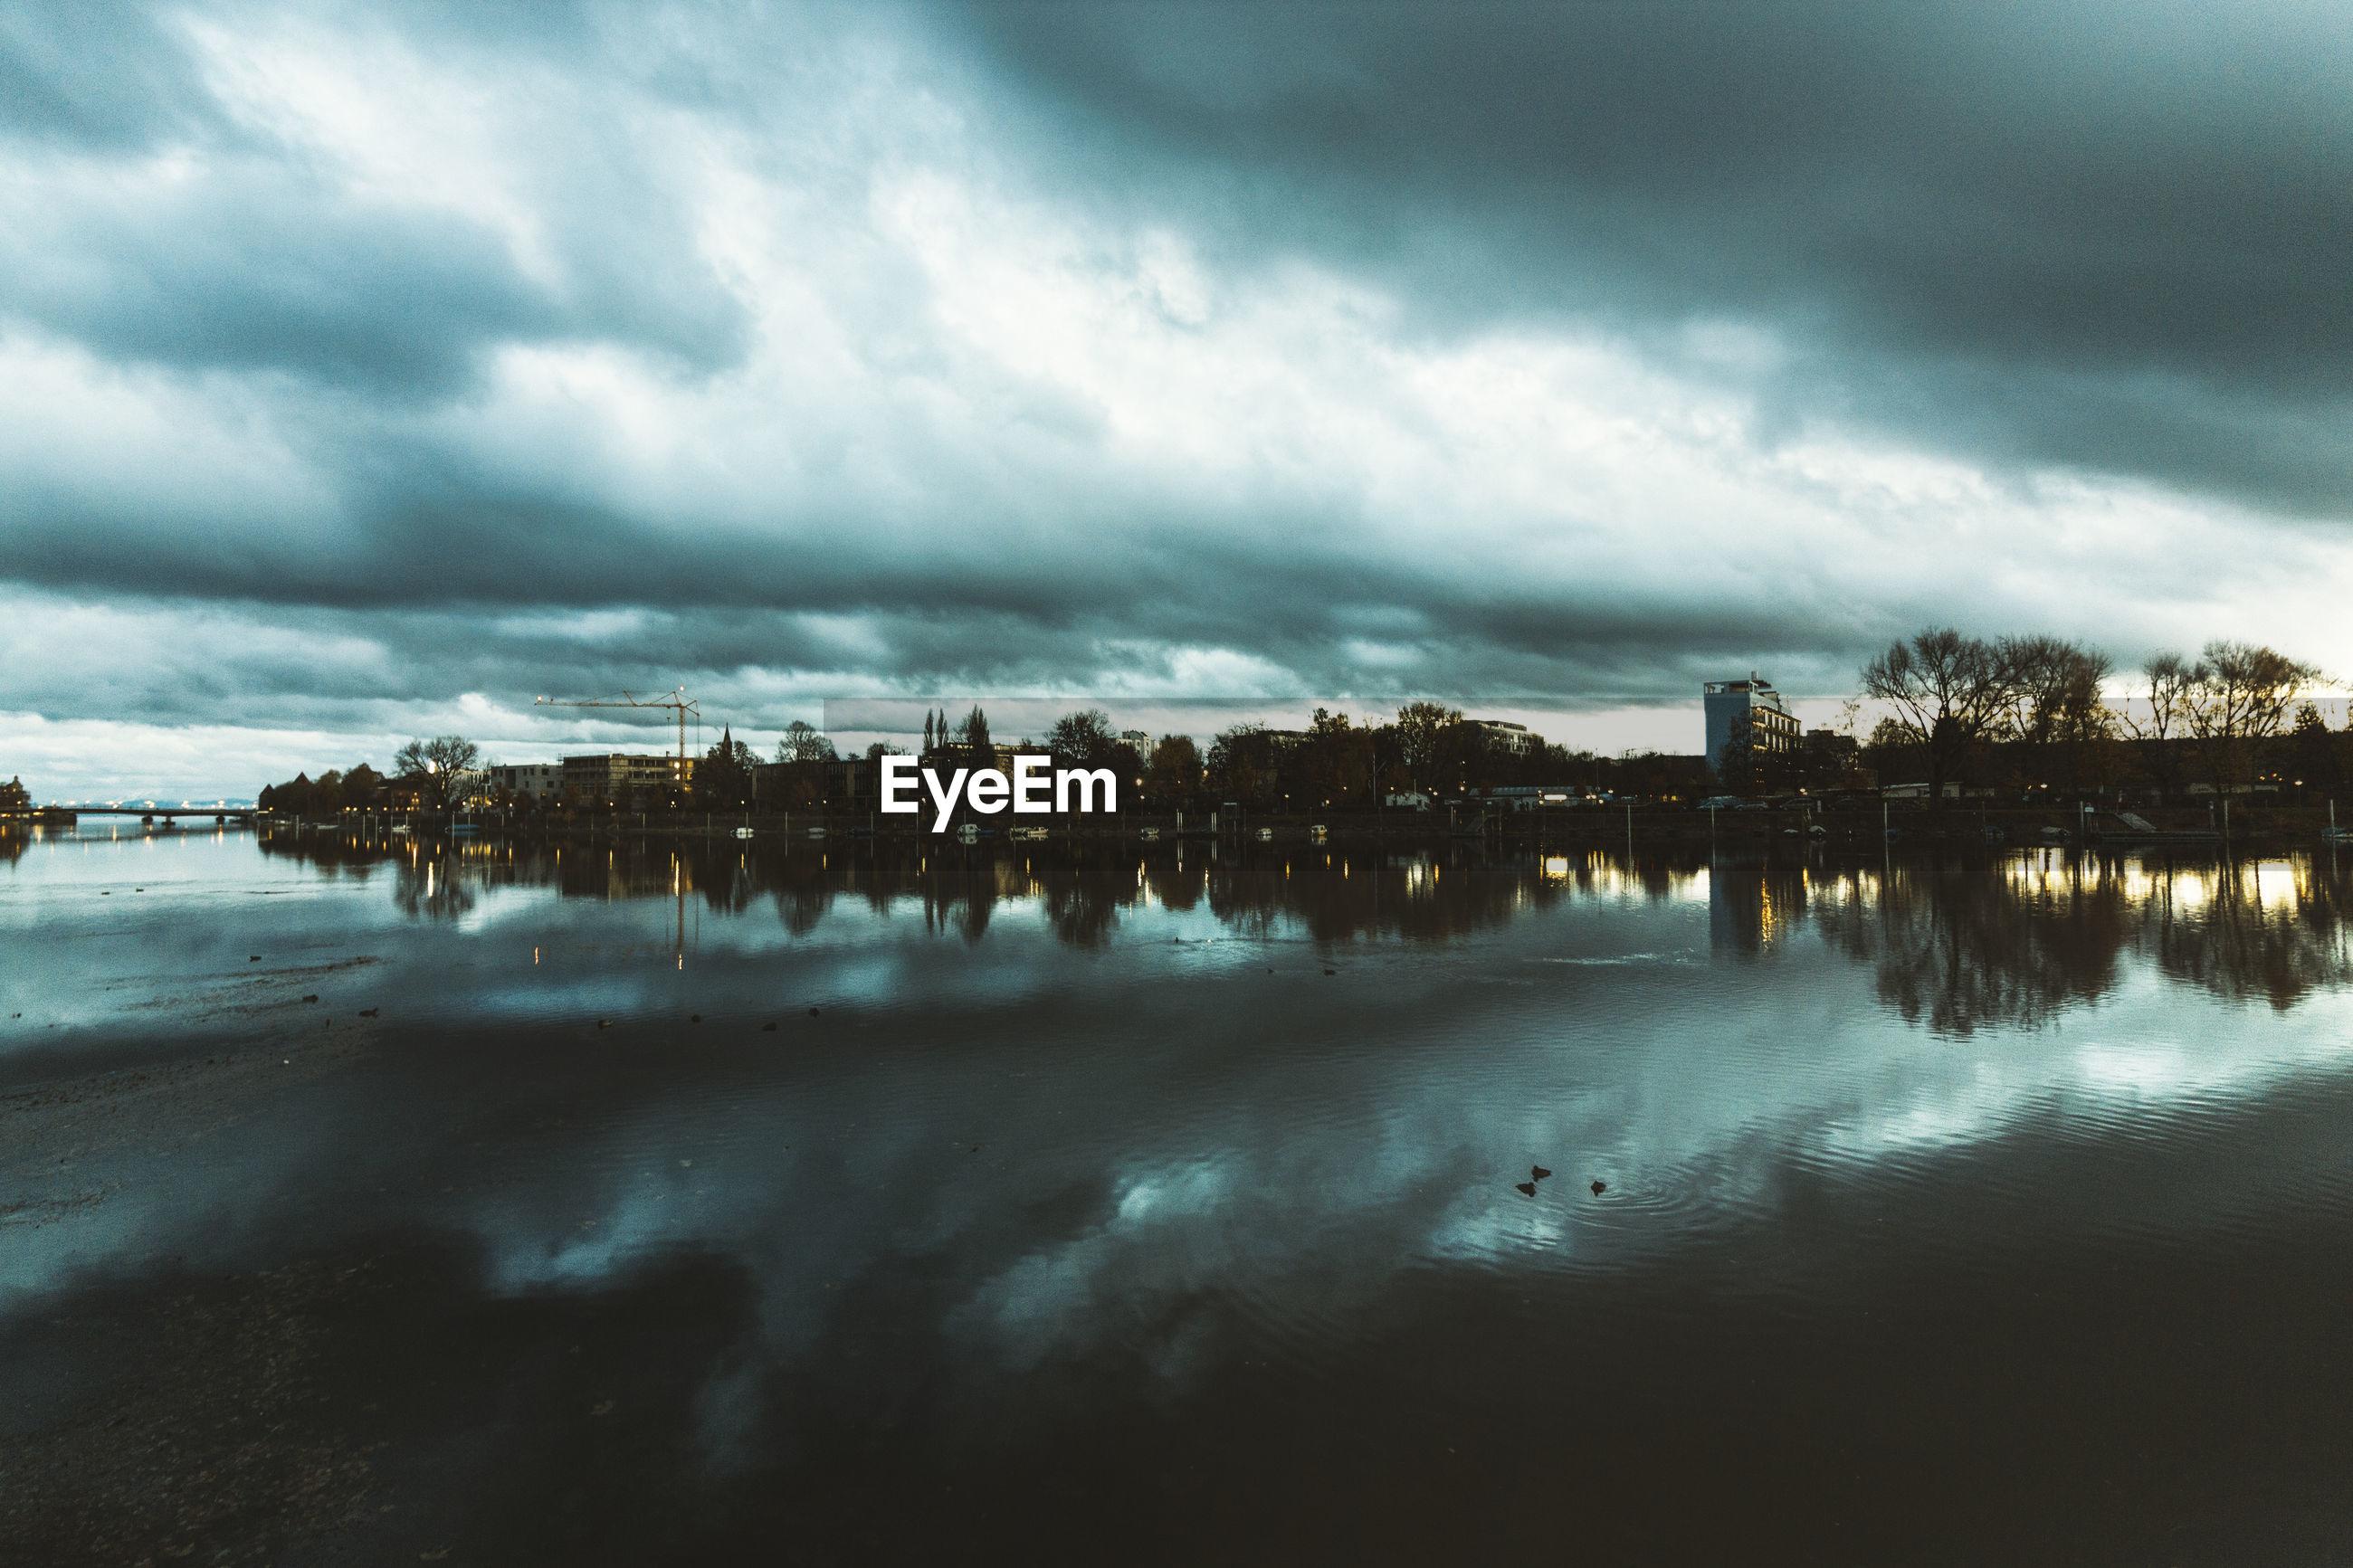 Cloudy sky reflecting on calm lake